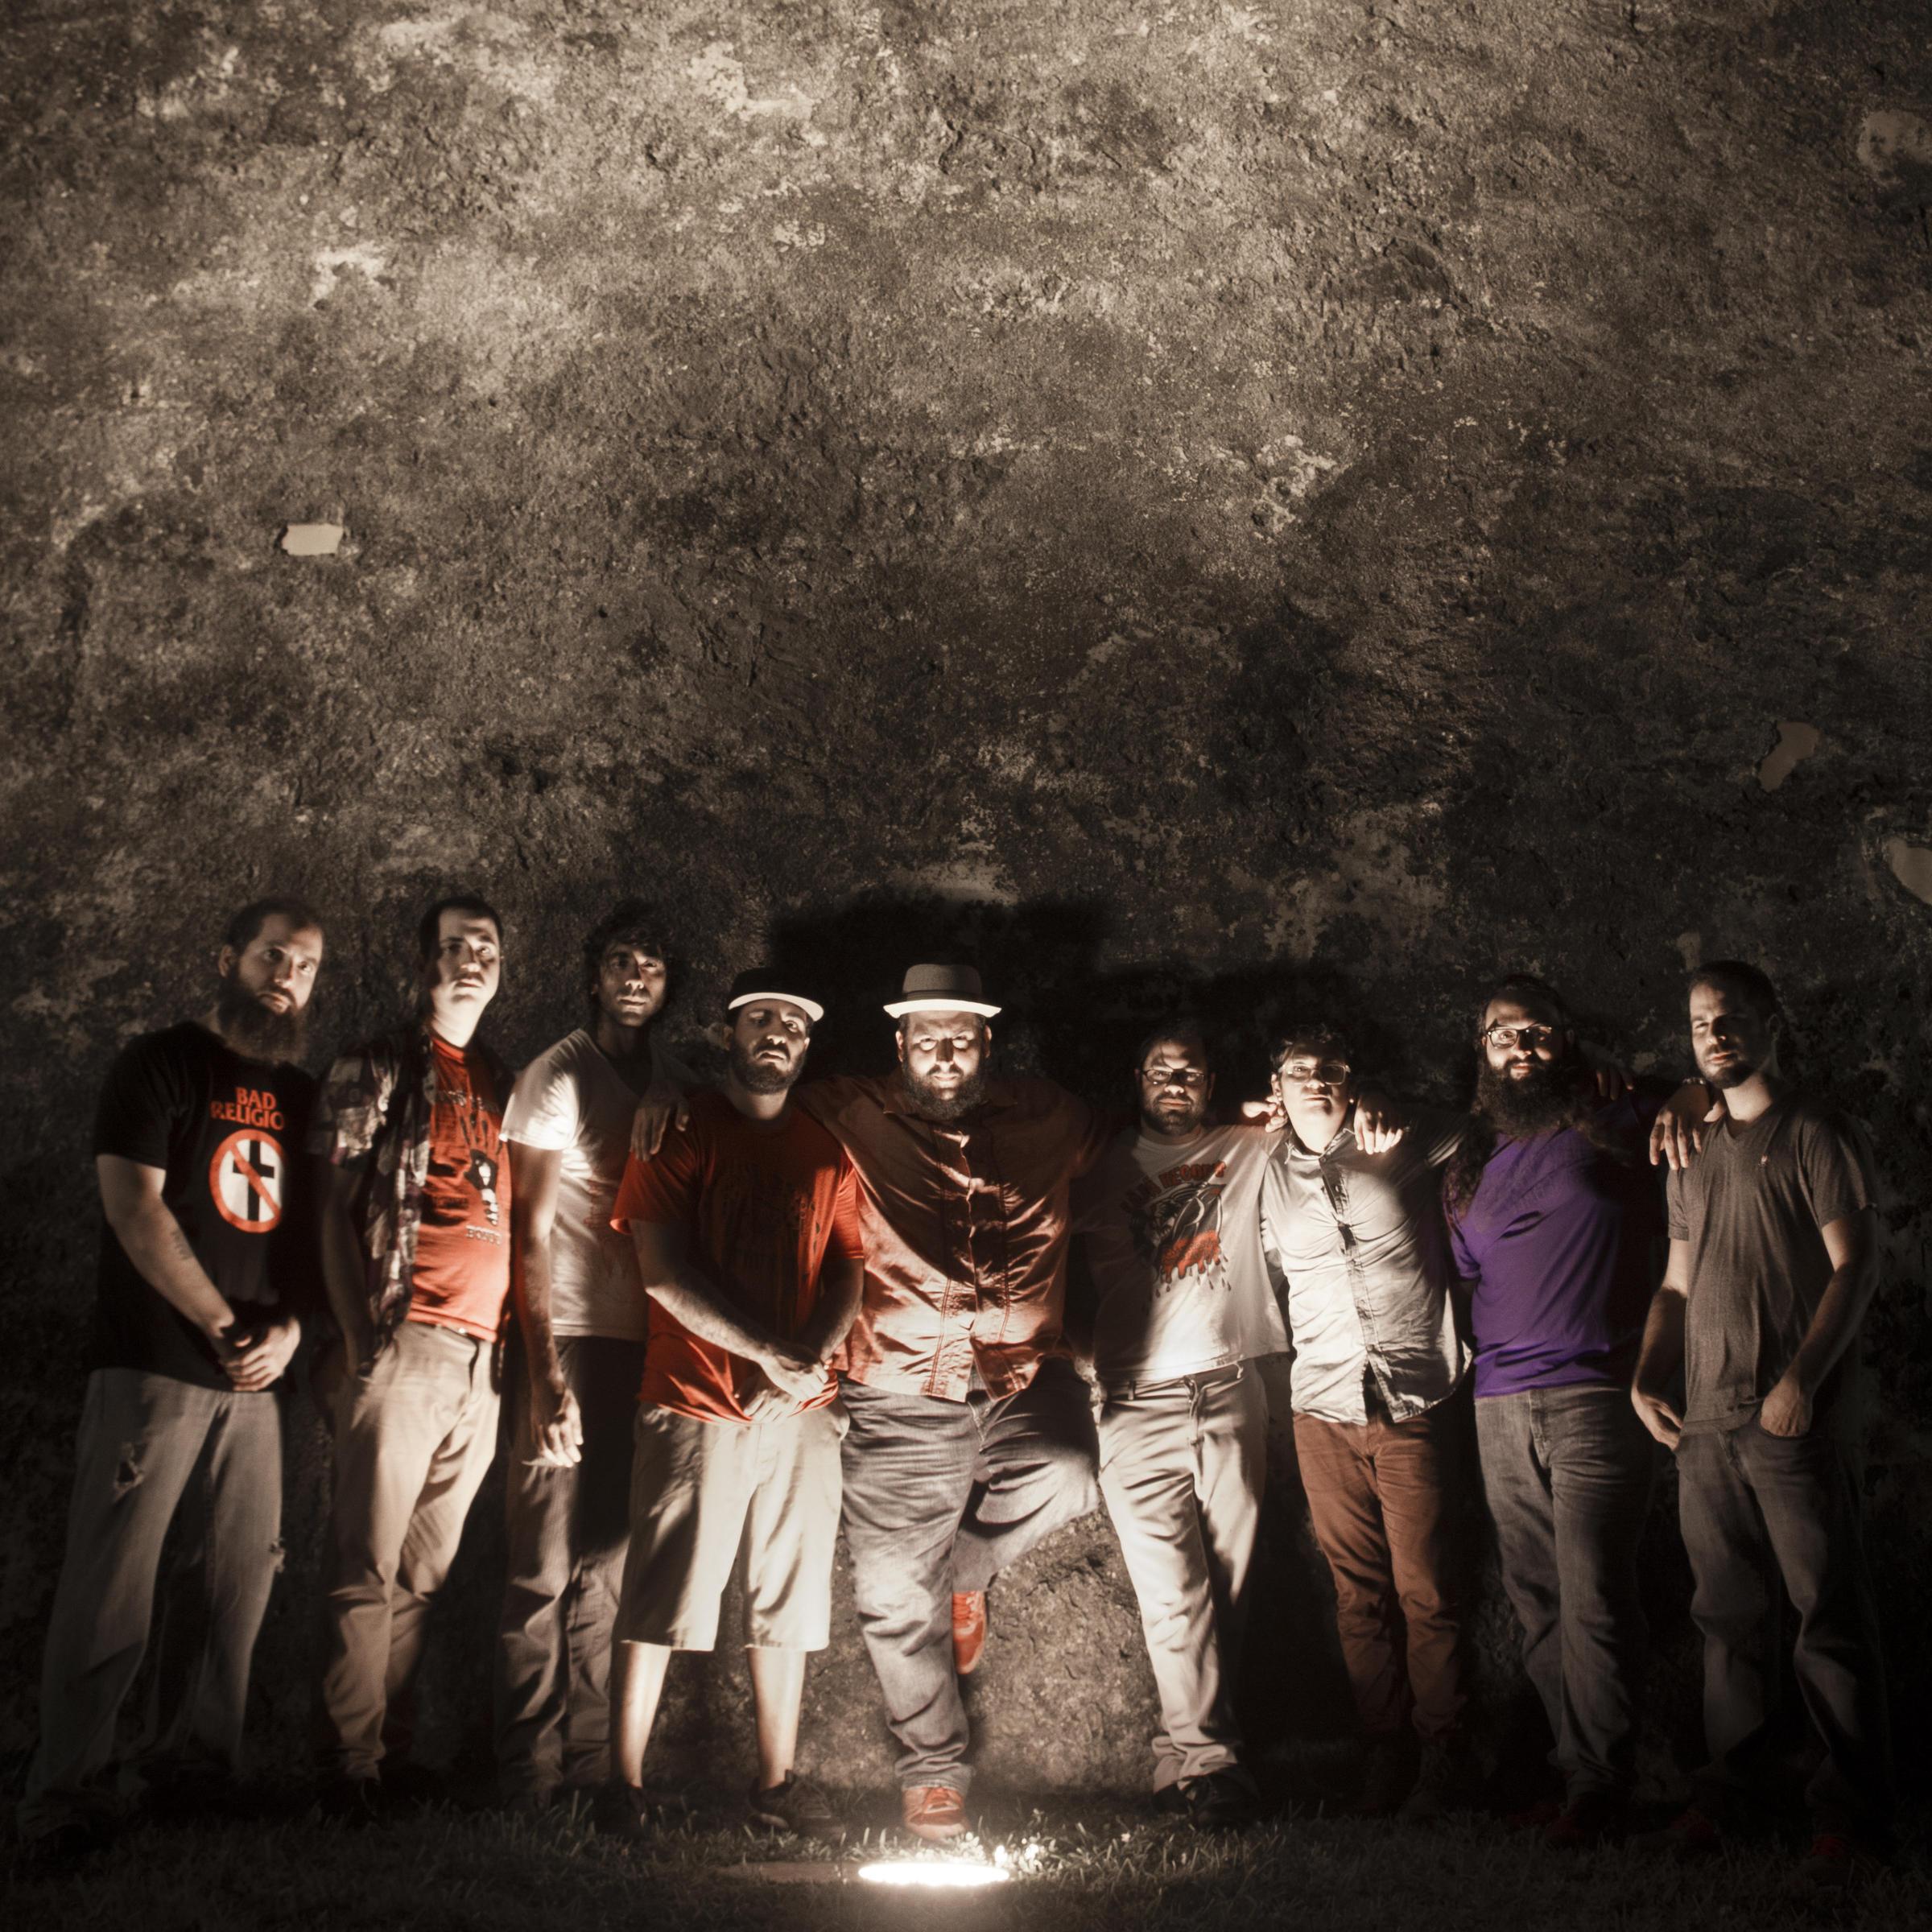 The Decemberists & Lin-Manuel Miranda's